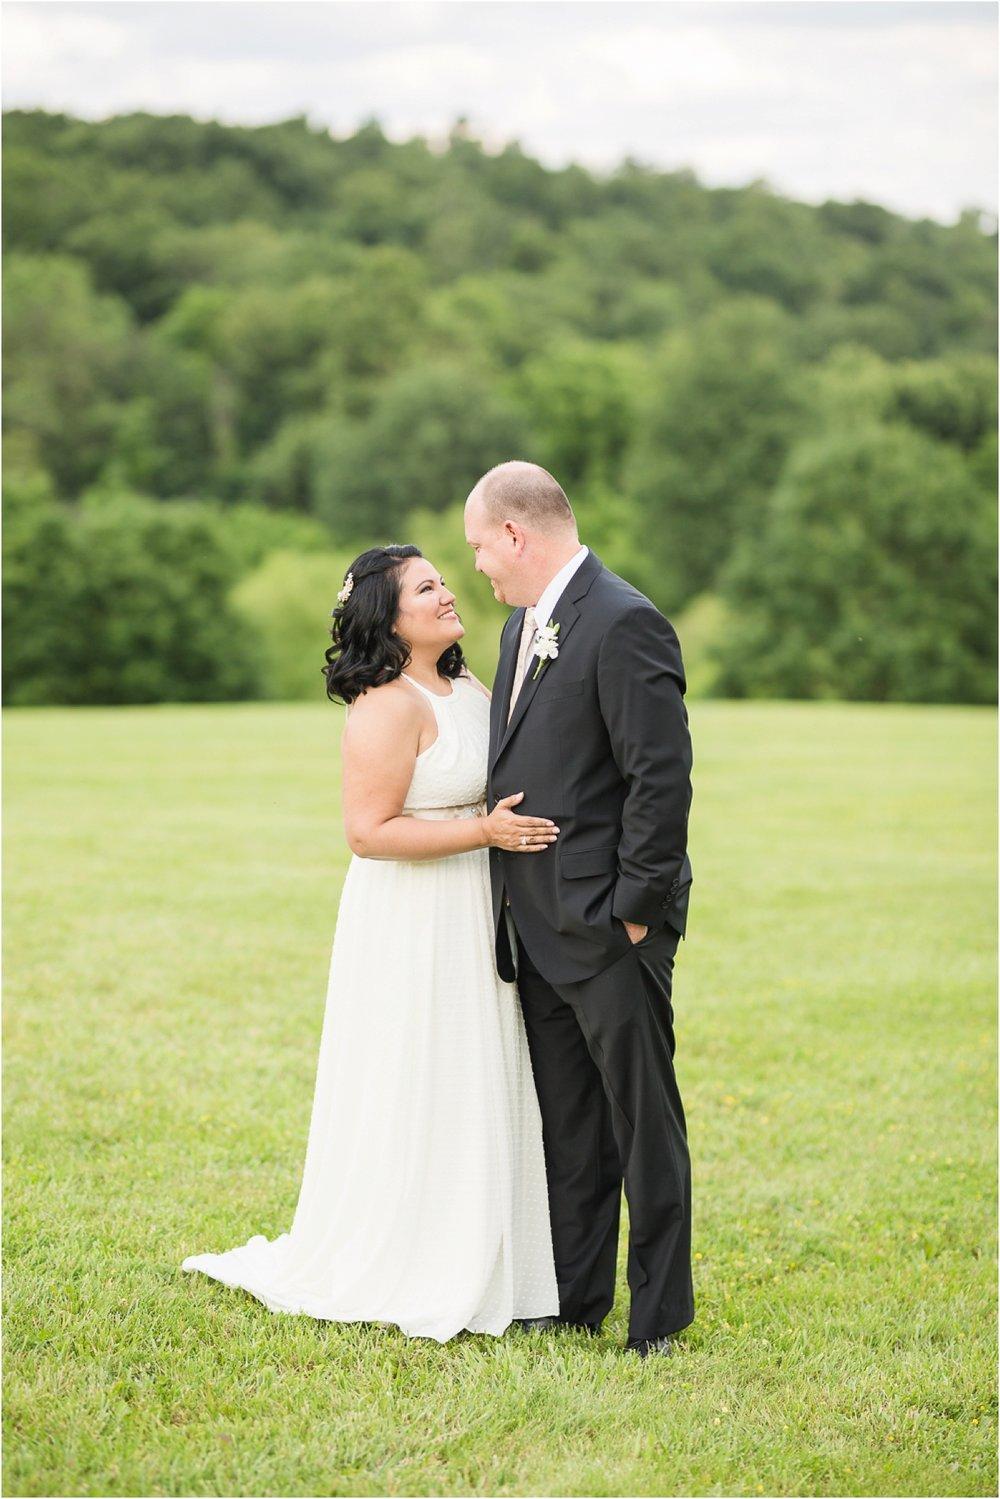 Gettysburg-Lodges-Wedding-136.jpg